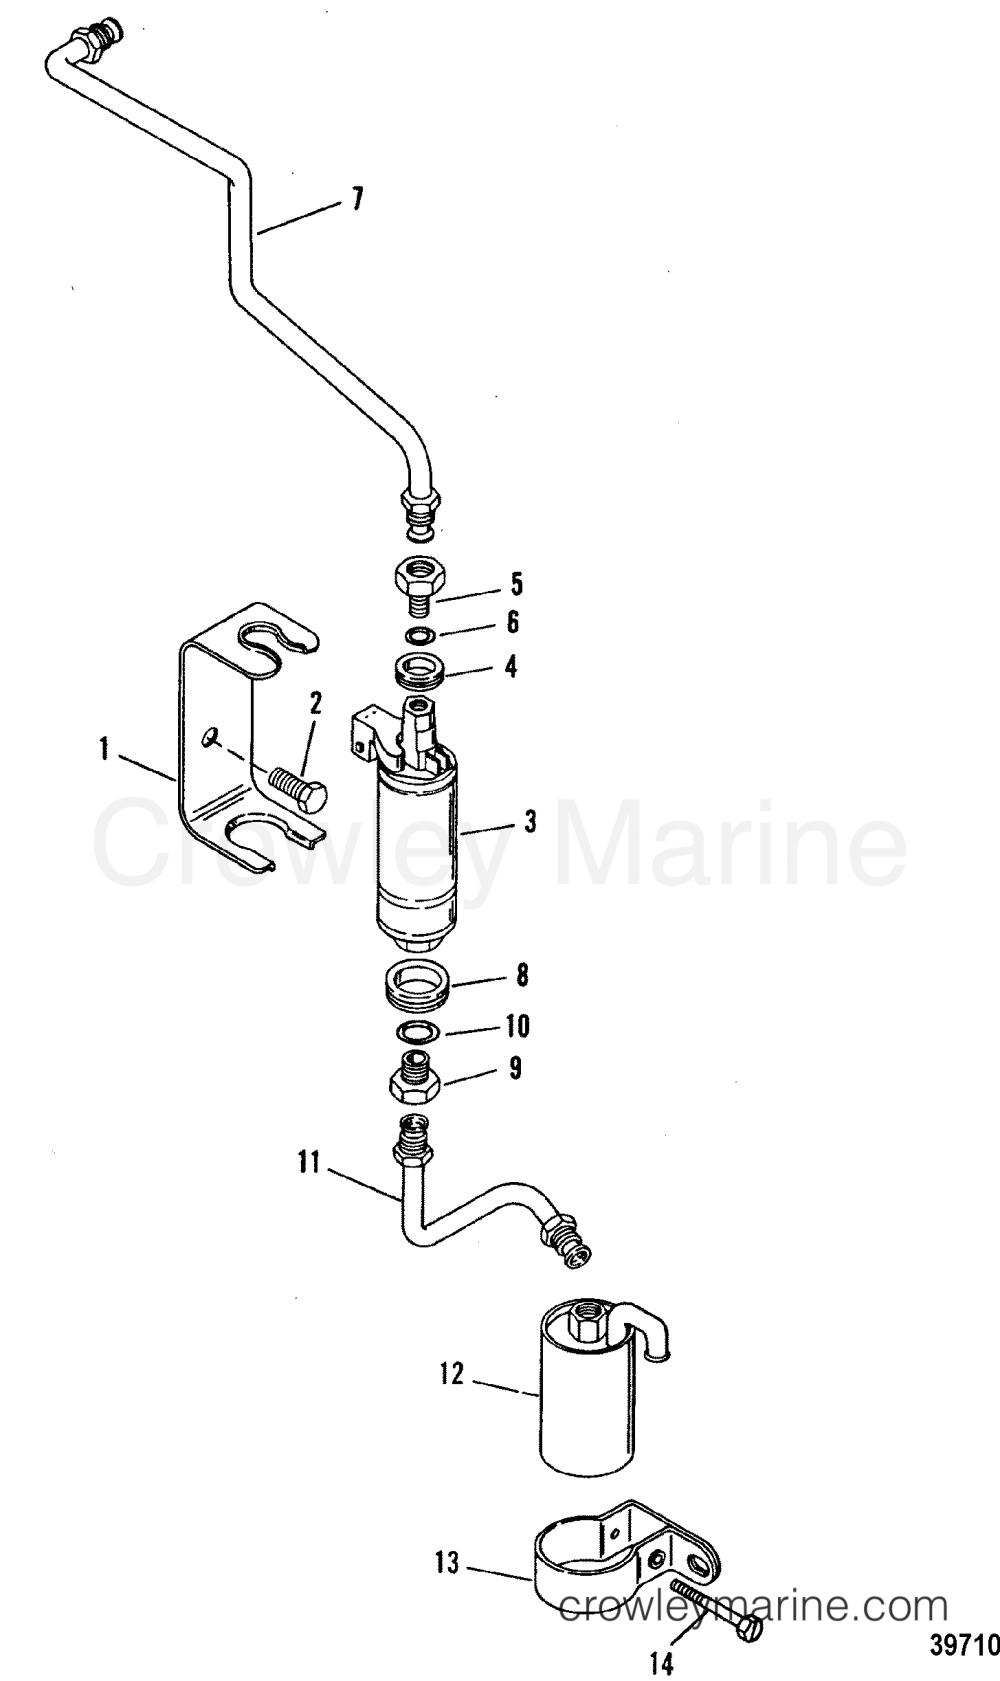 medium resolution of fuel pump and fuel filter 1992 mercruiser 4 3l alpha i 443b0002s diagram of 1992 mercruiser 443b1012s fuel pump and fuel filter diagram